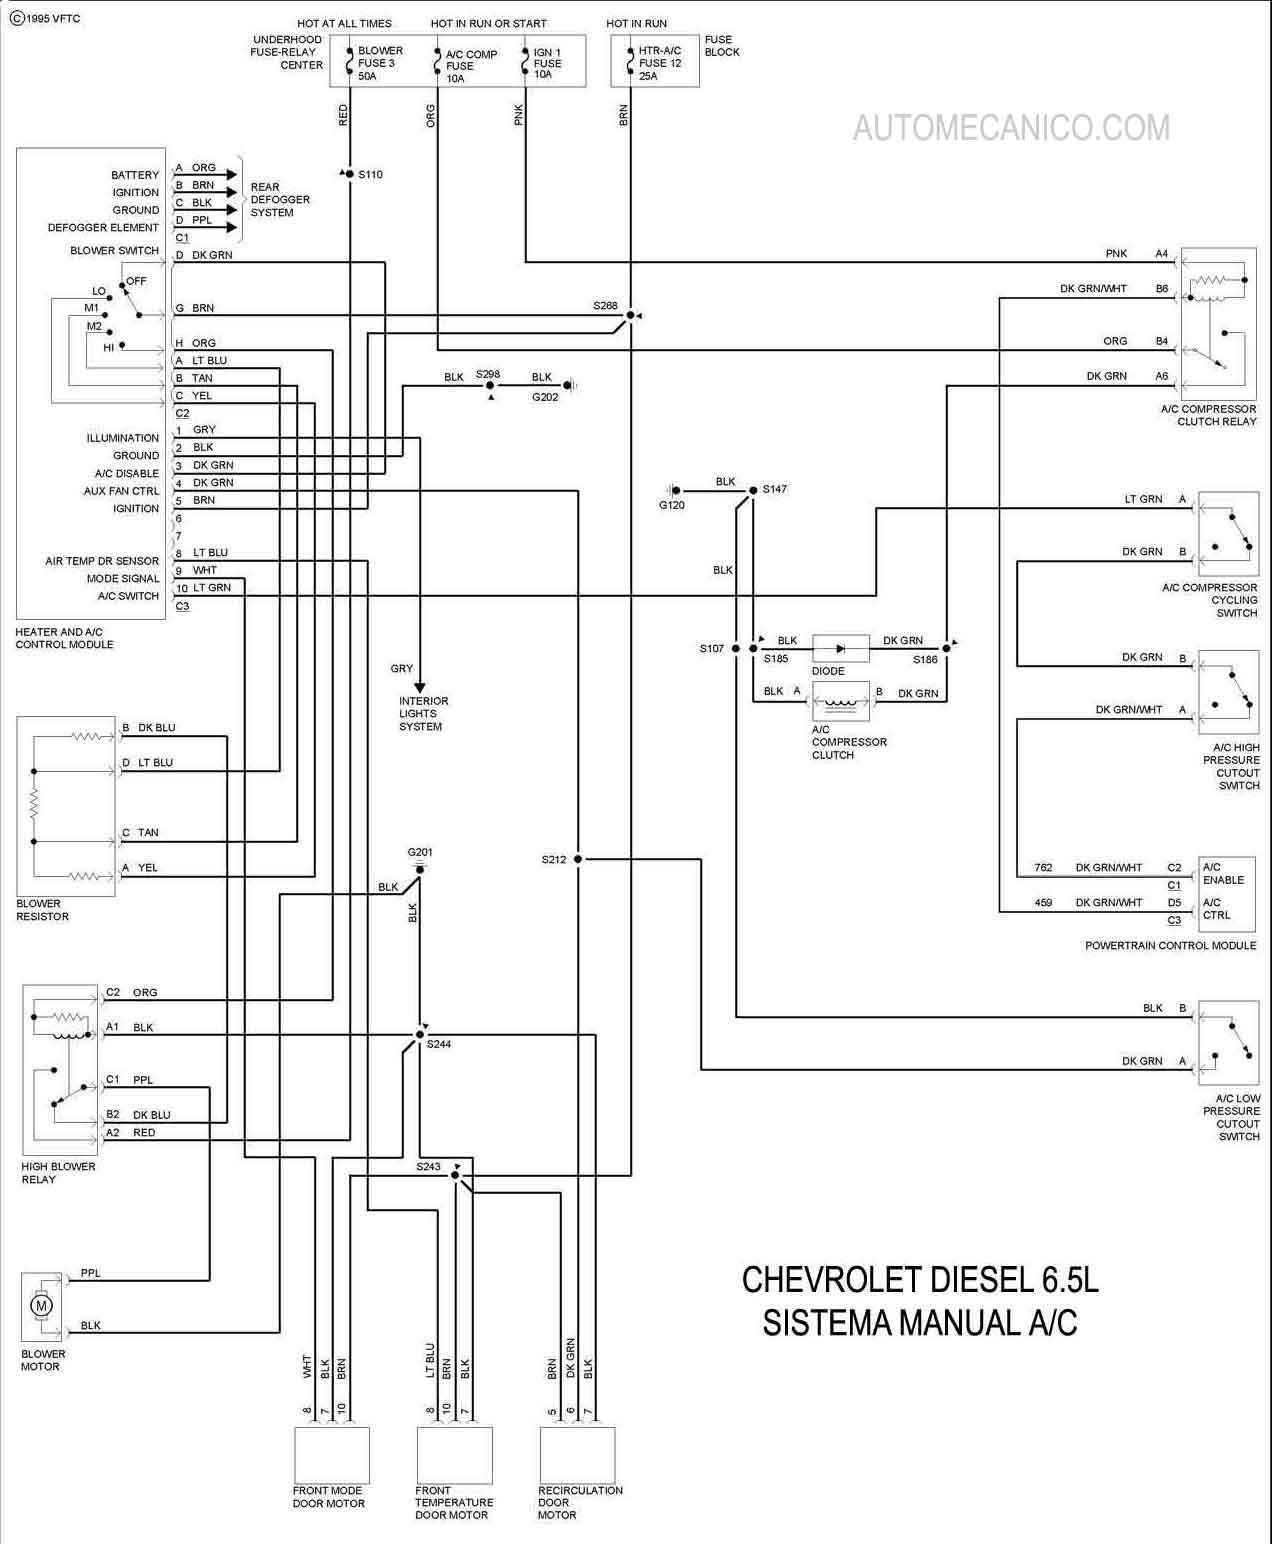 1989 Gmc S15 Wiring Diagrams Diagram